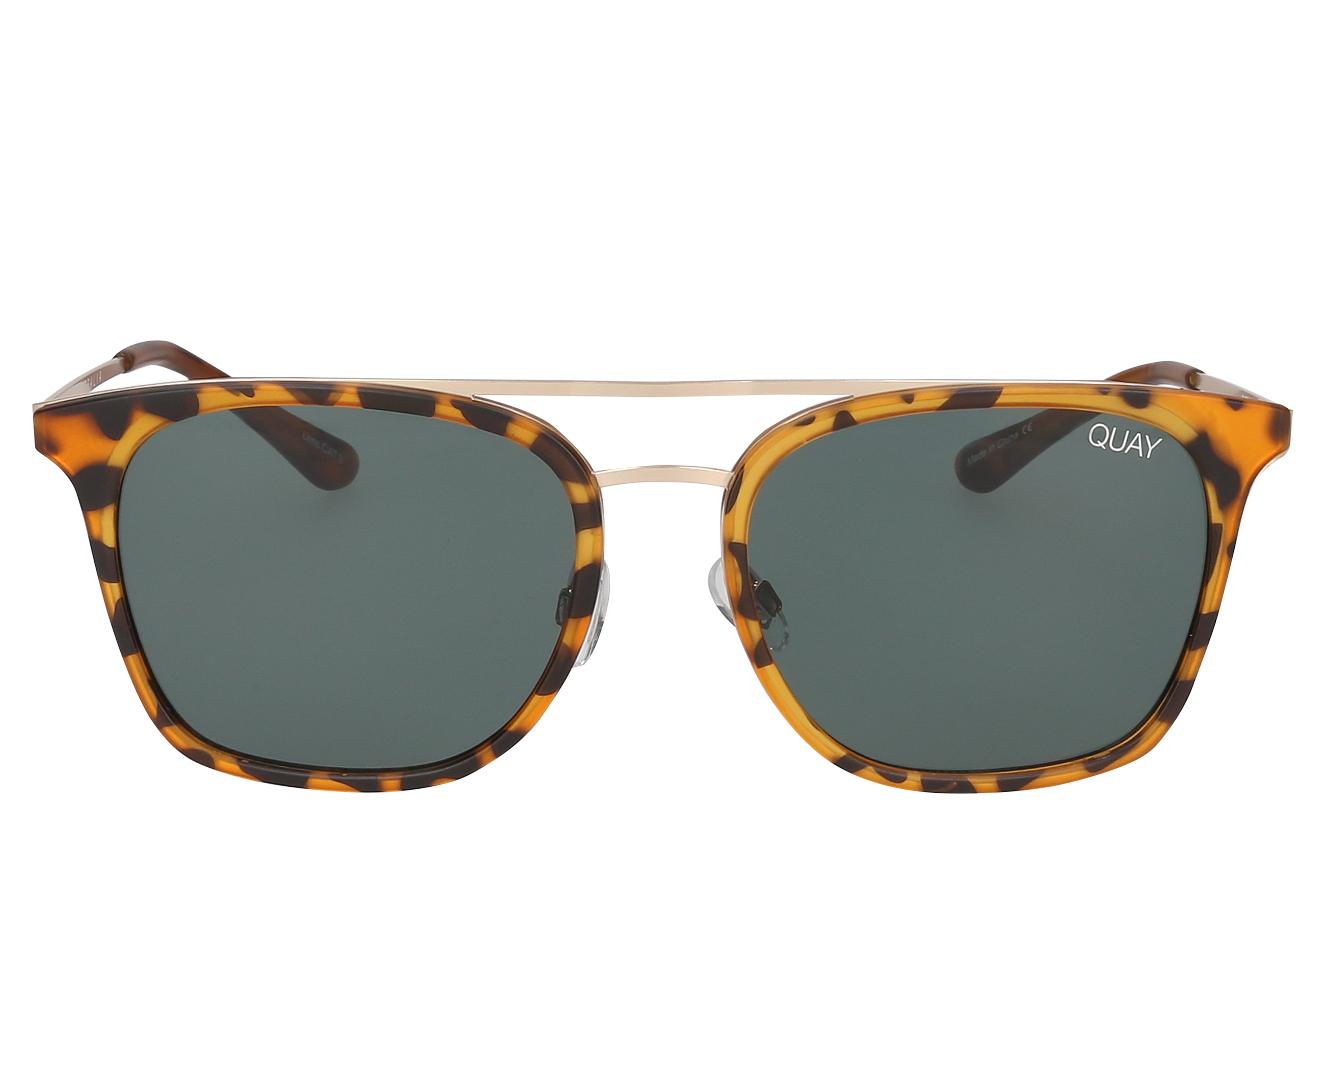 6ad7fbc4faddb5 Quay Australia Men s Byron Sunglasses - Tortoise Green